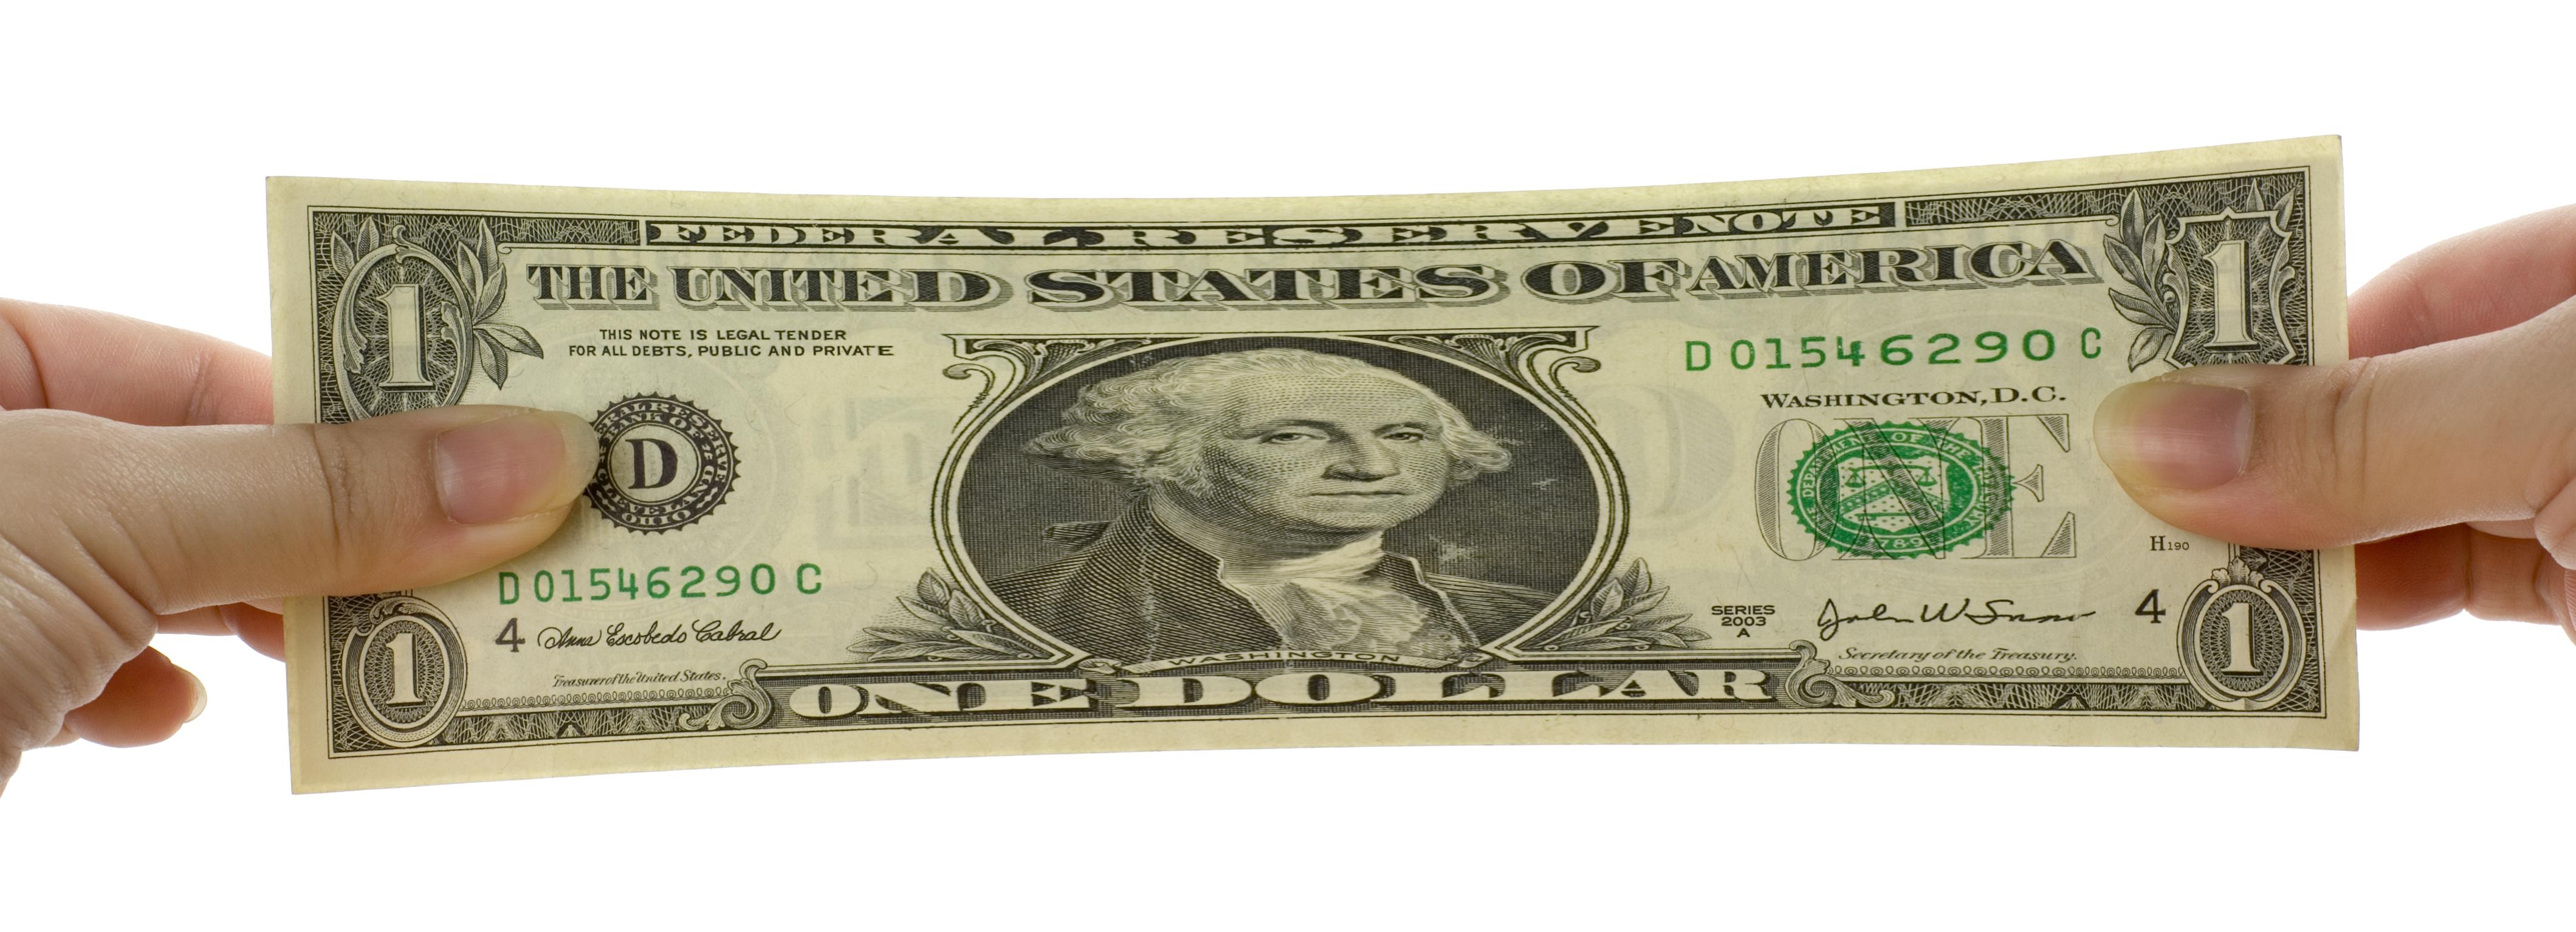 Stretched dollar